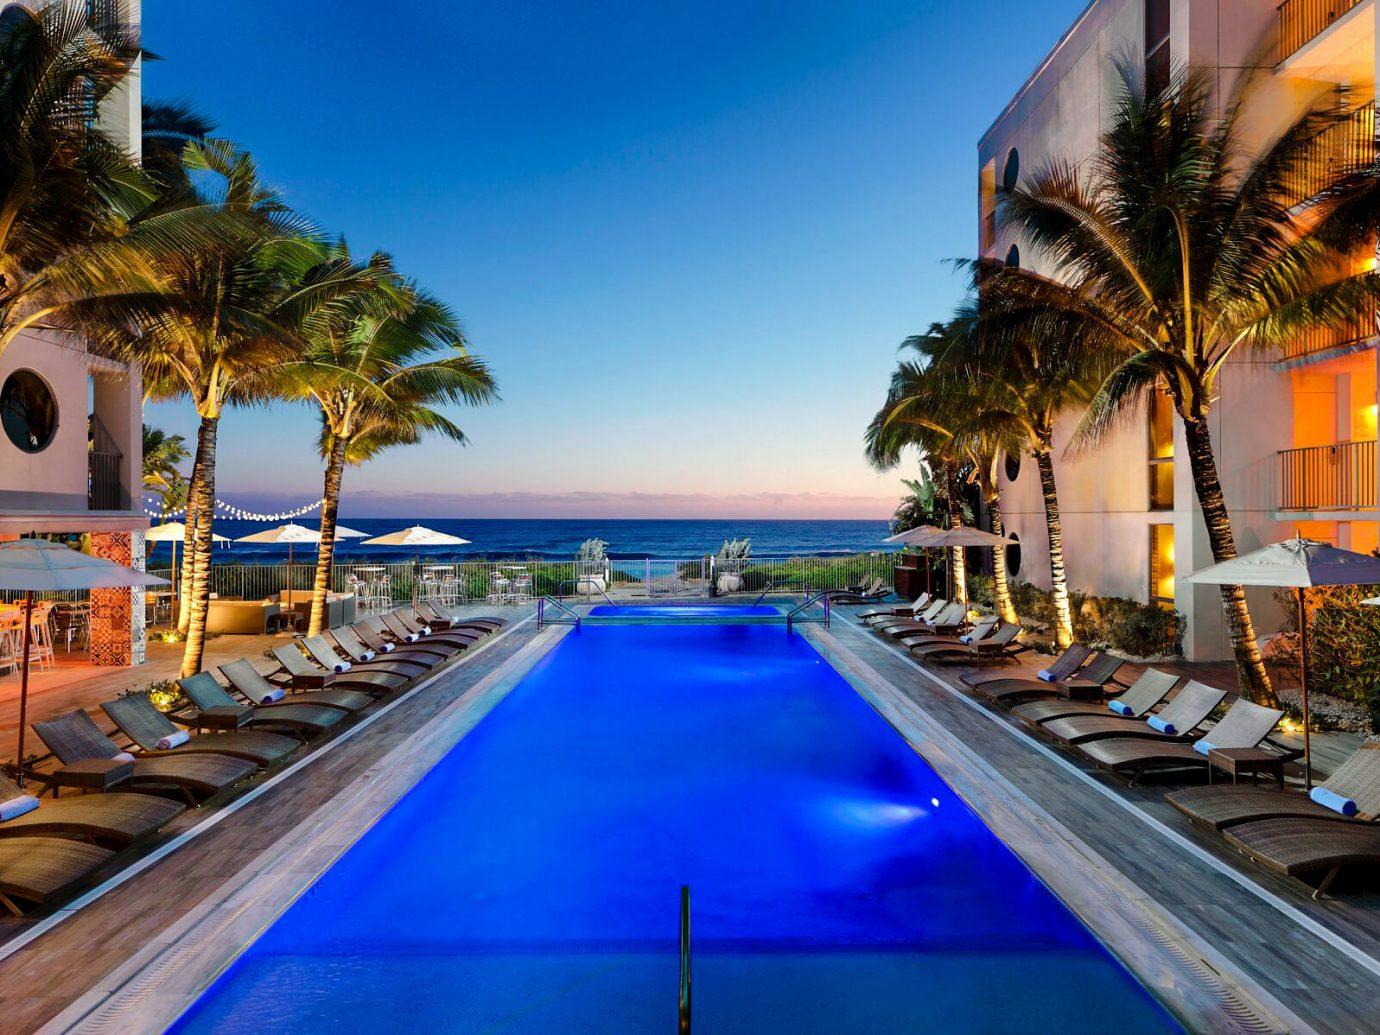 Trip Ideas tree sky outdoor leisure swimming pool Resort vacation estate caribbean marina Villa lined palm